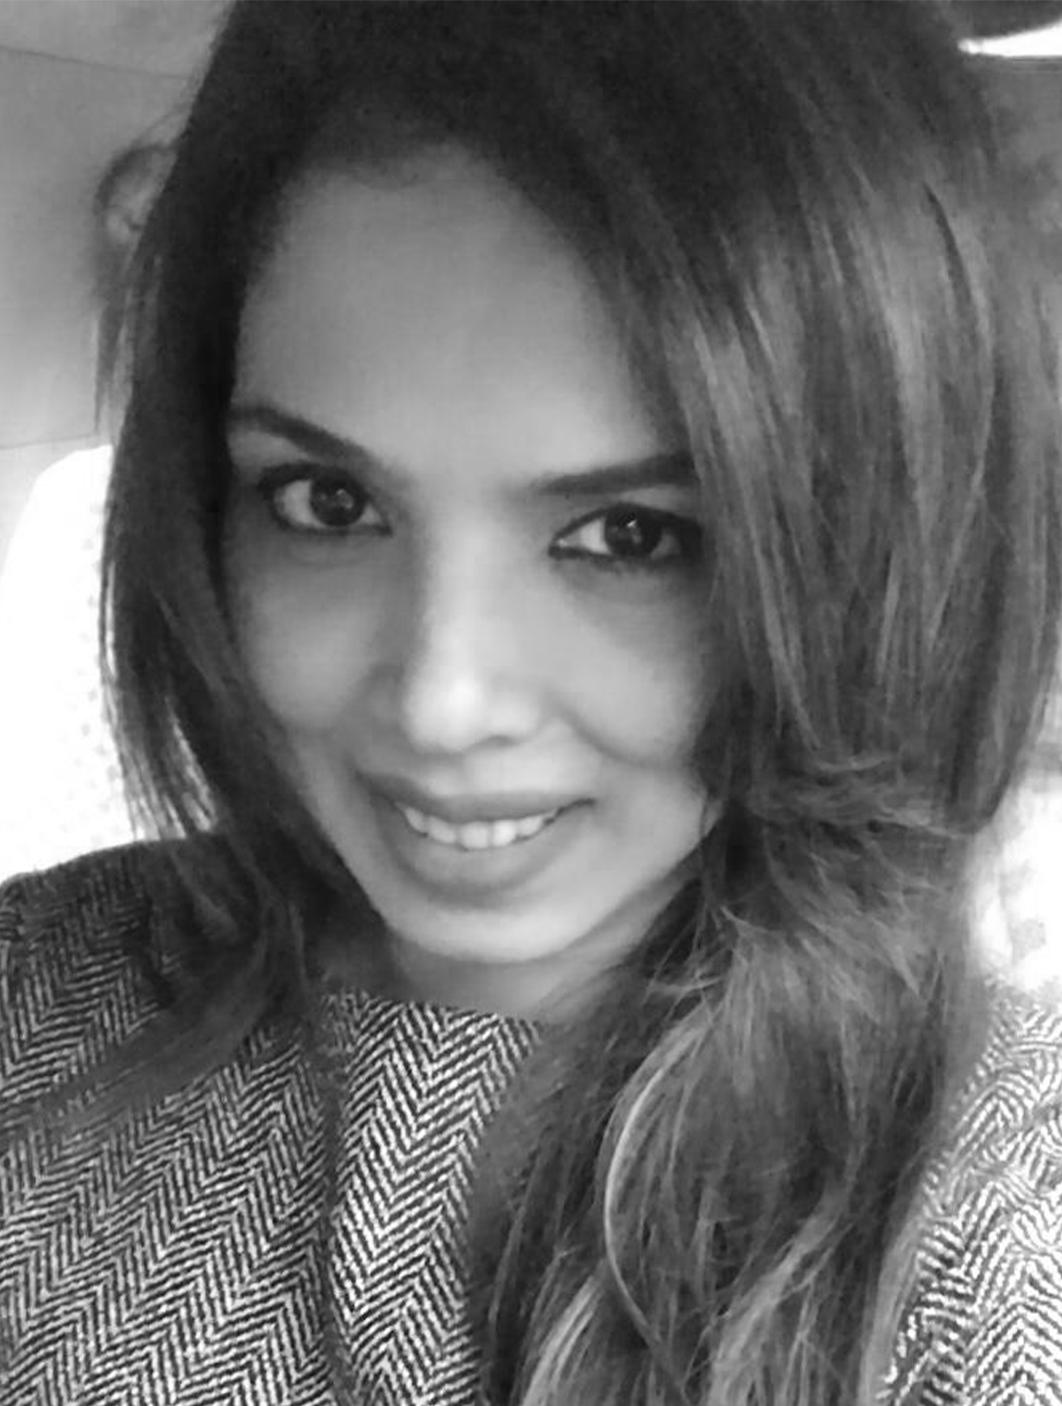 Rashna Pochkhanwala - Senior Vice President, SAREGAMA, experienced in sales across Music,TV, Digital, Print, and Integrated Media Platforms